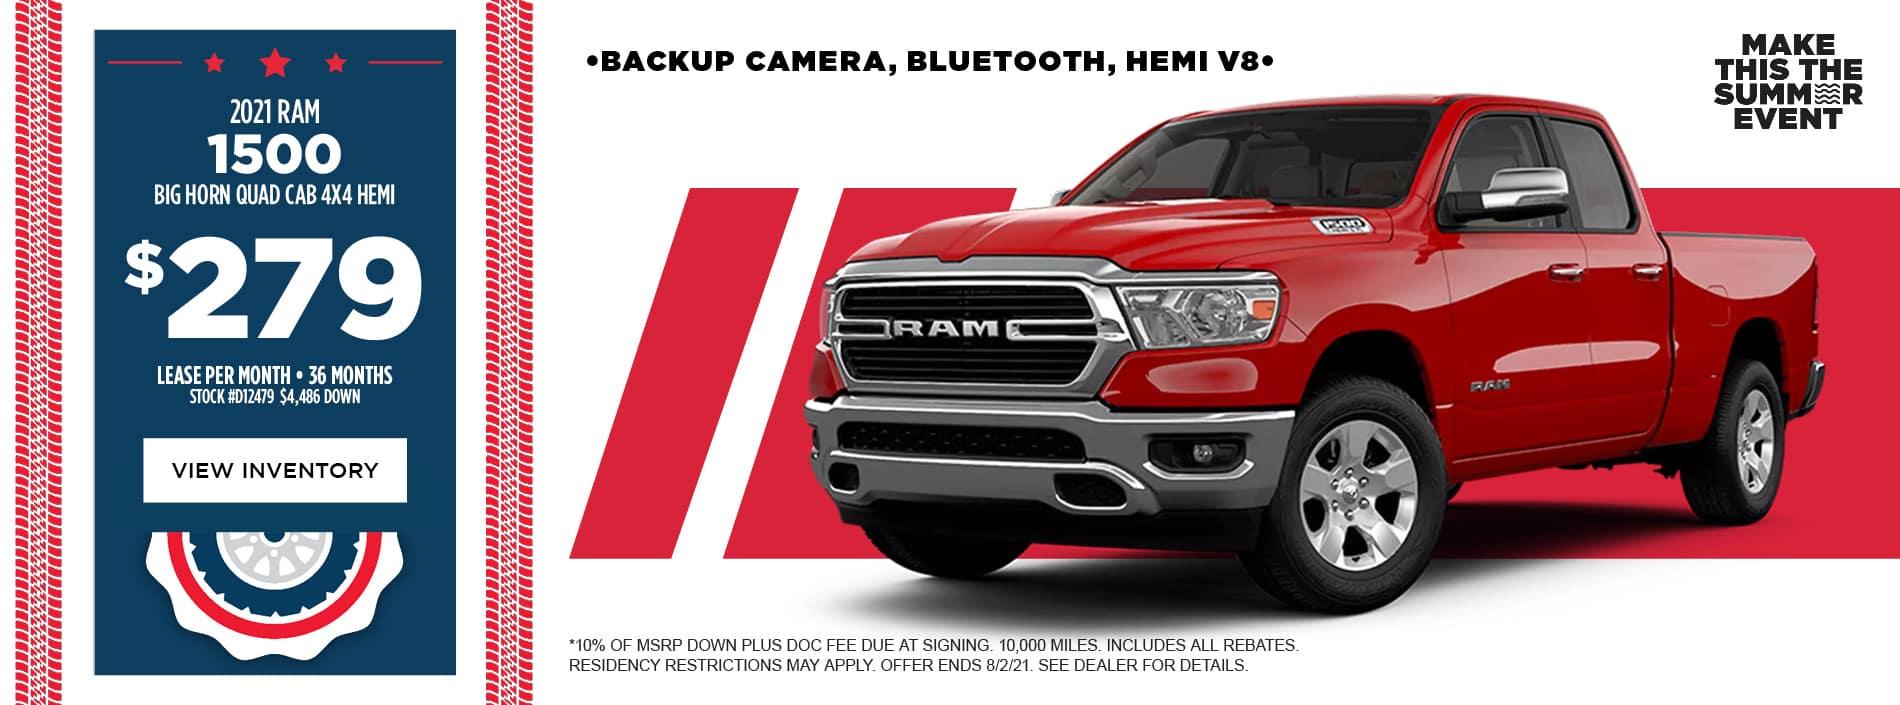 2021 RAM 1500 Big Horn Quad Cab 4x4 HEMI